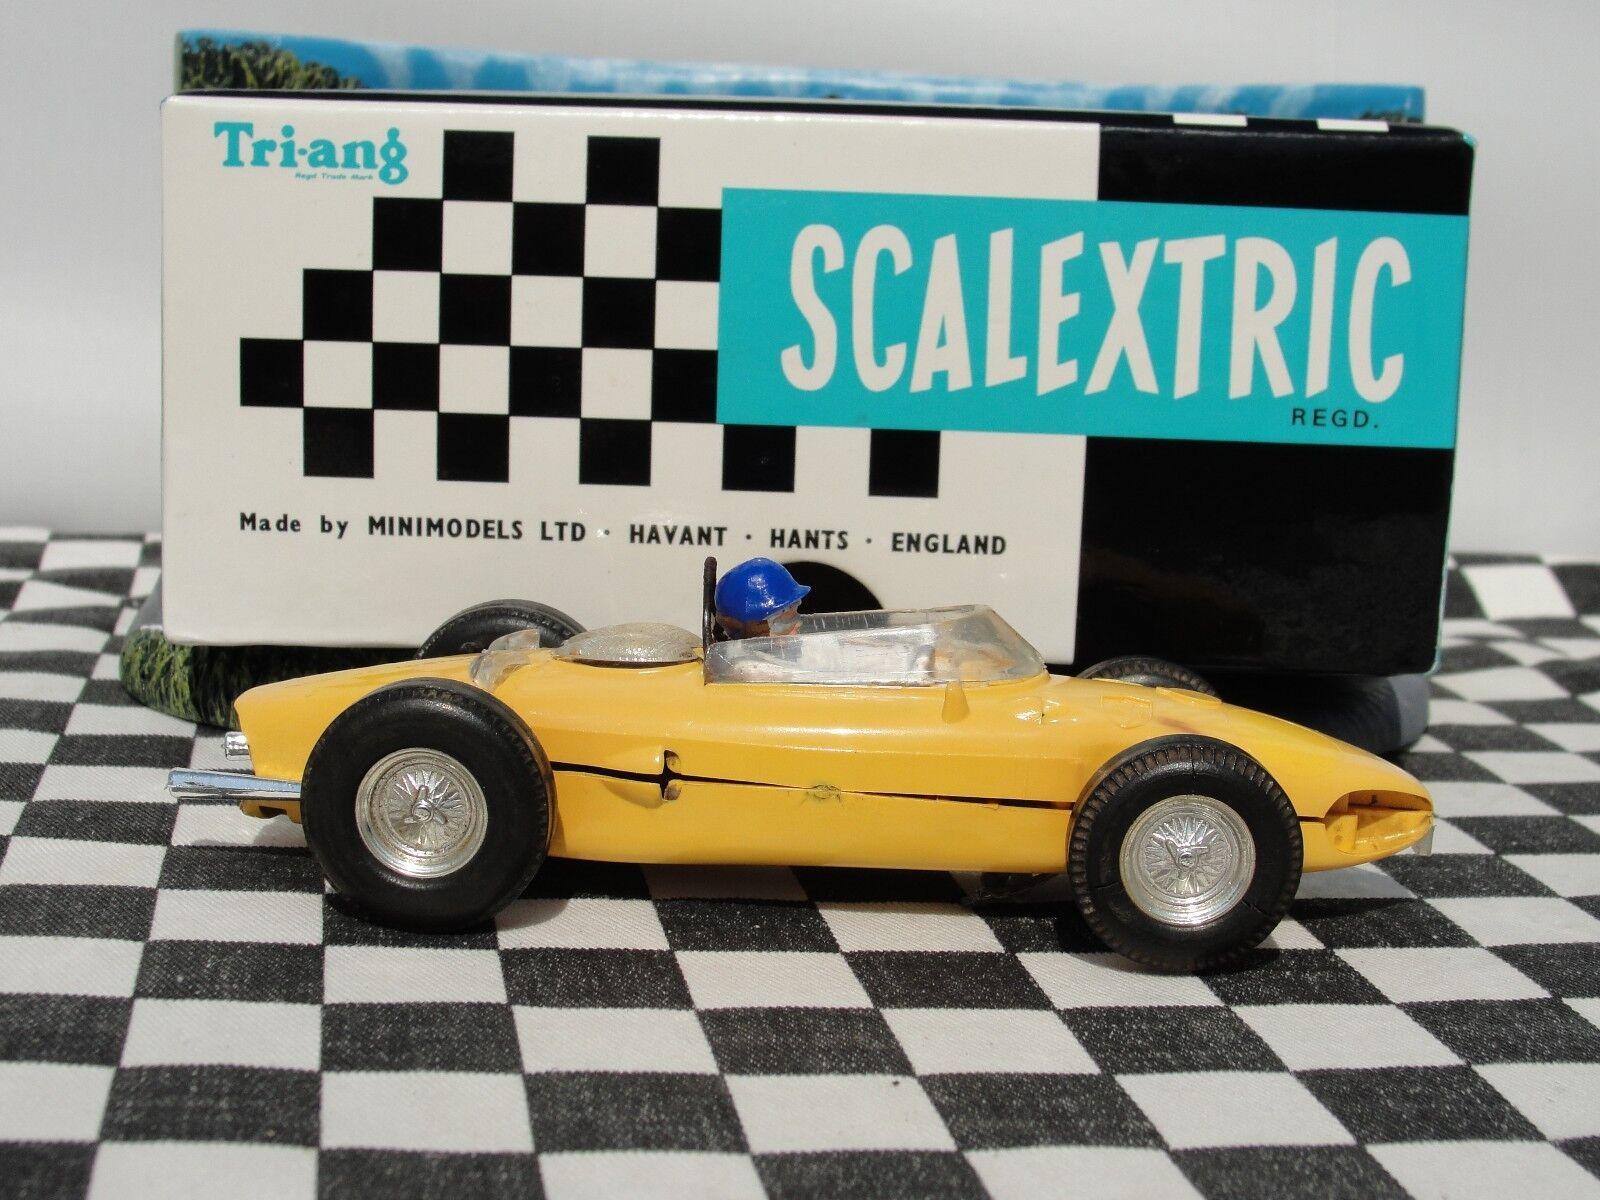 SCALEXTRIC 1960'S FERRARI  YELLOW  C62 1 32 SLOT USED BOXED